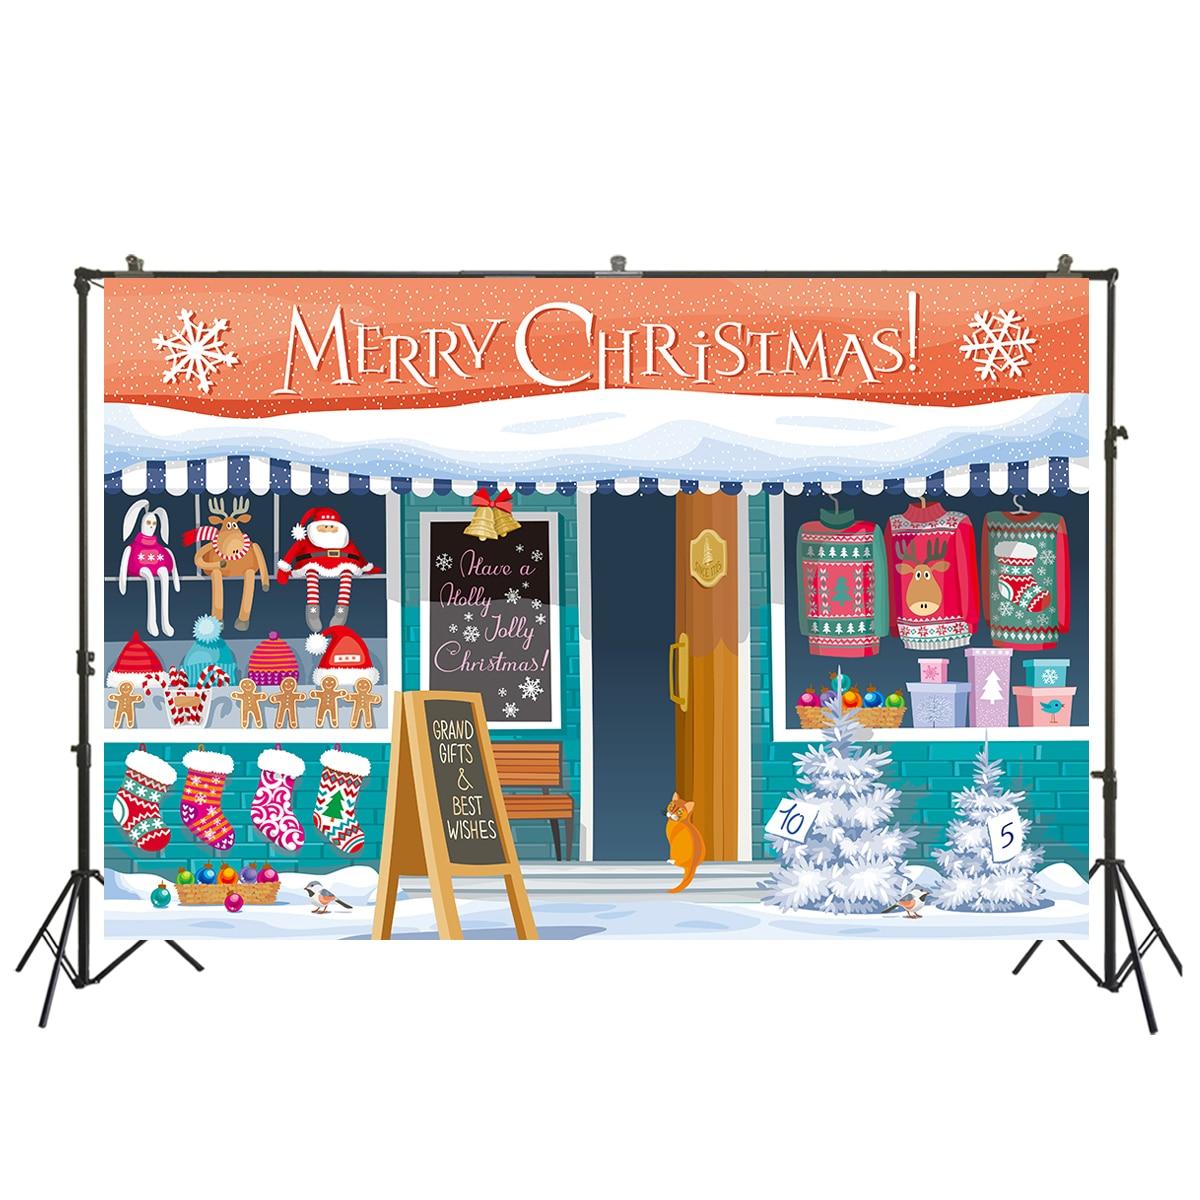 Photography Background Christmas Shop Board Sock Tree Santa Claus Customized Photographic Backdrops for Photo Studio XT-7737